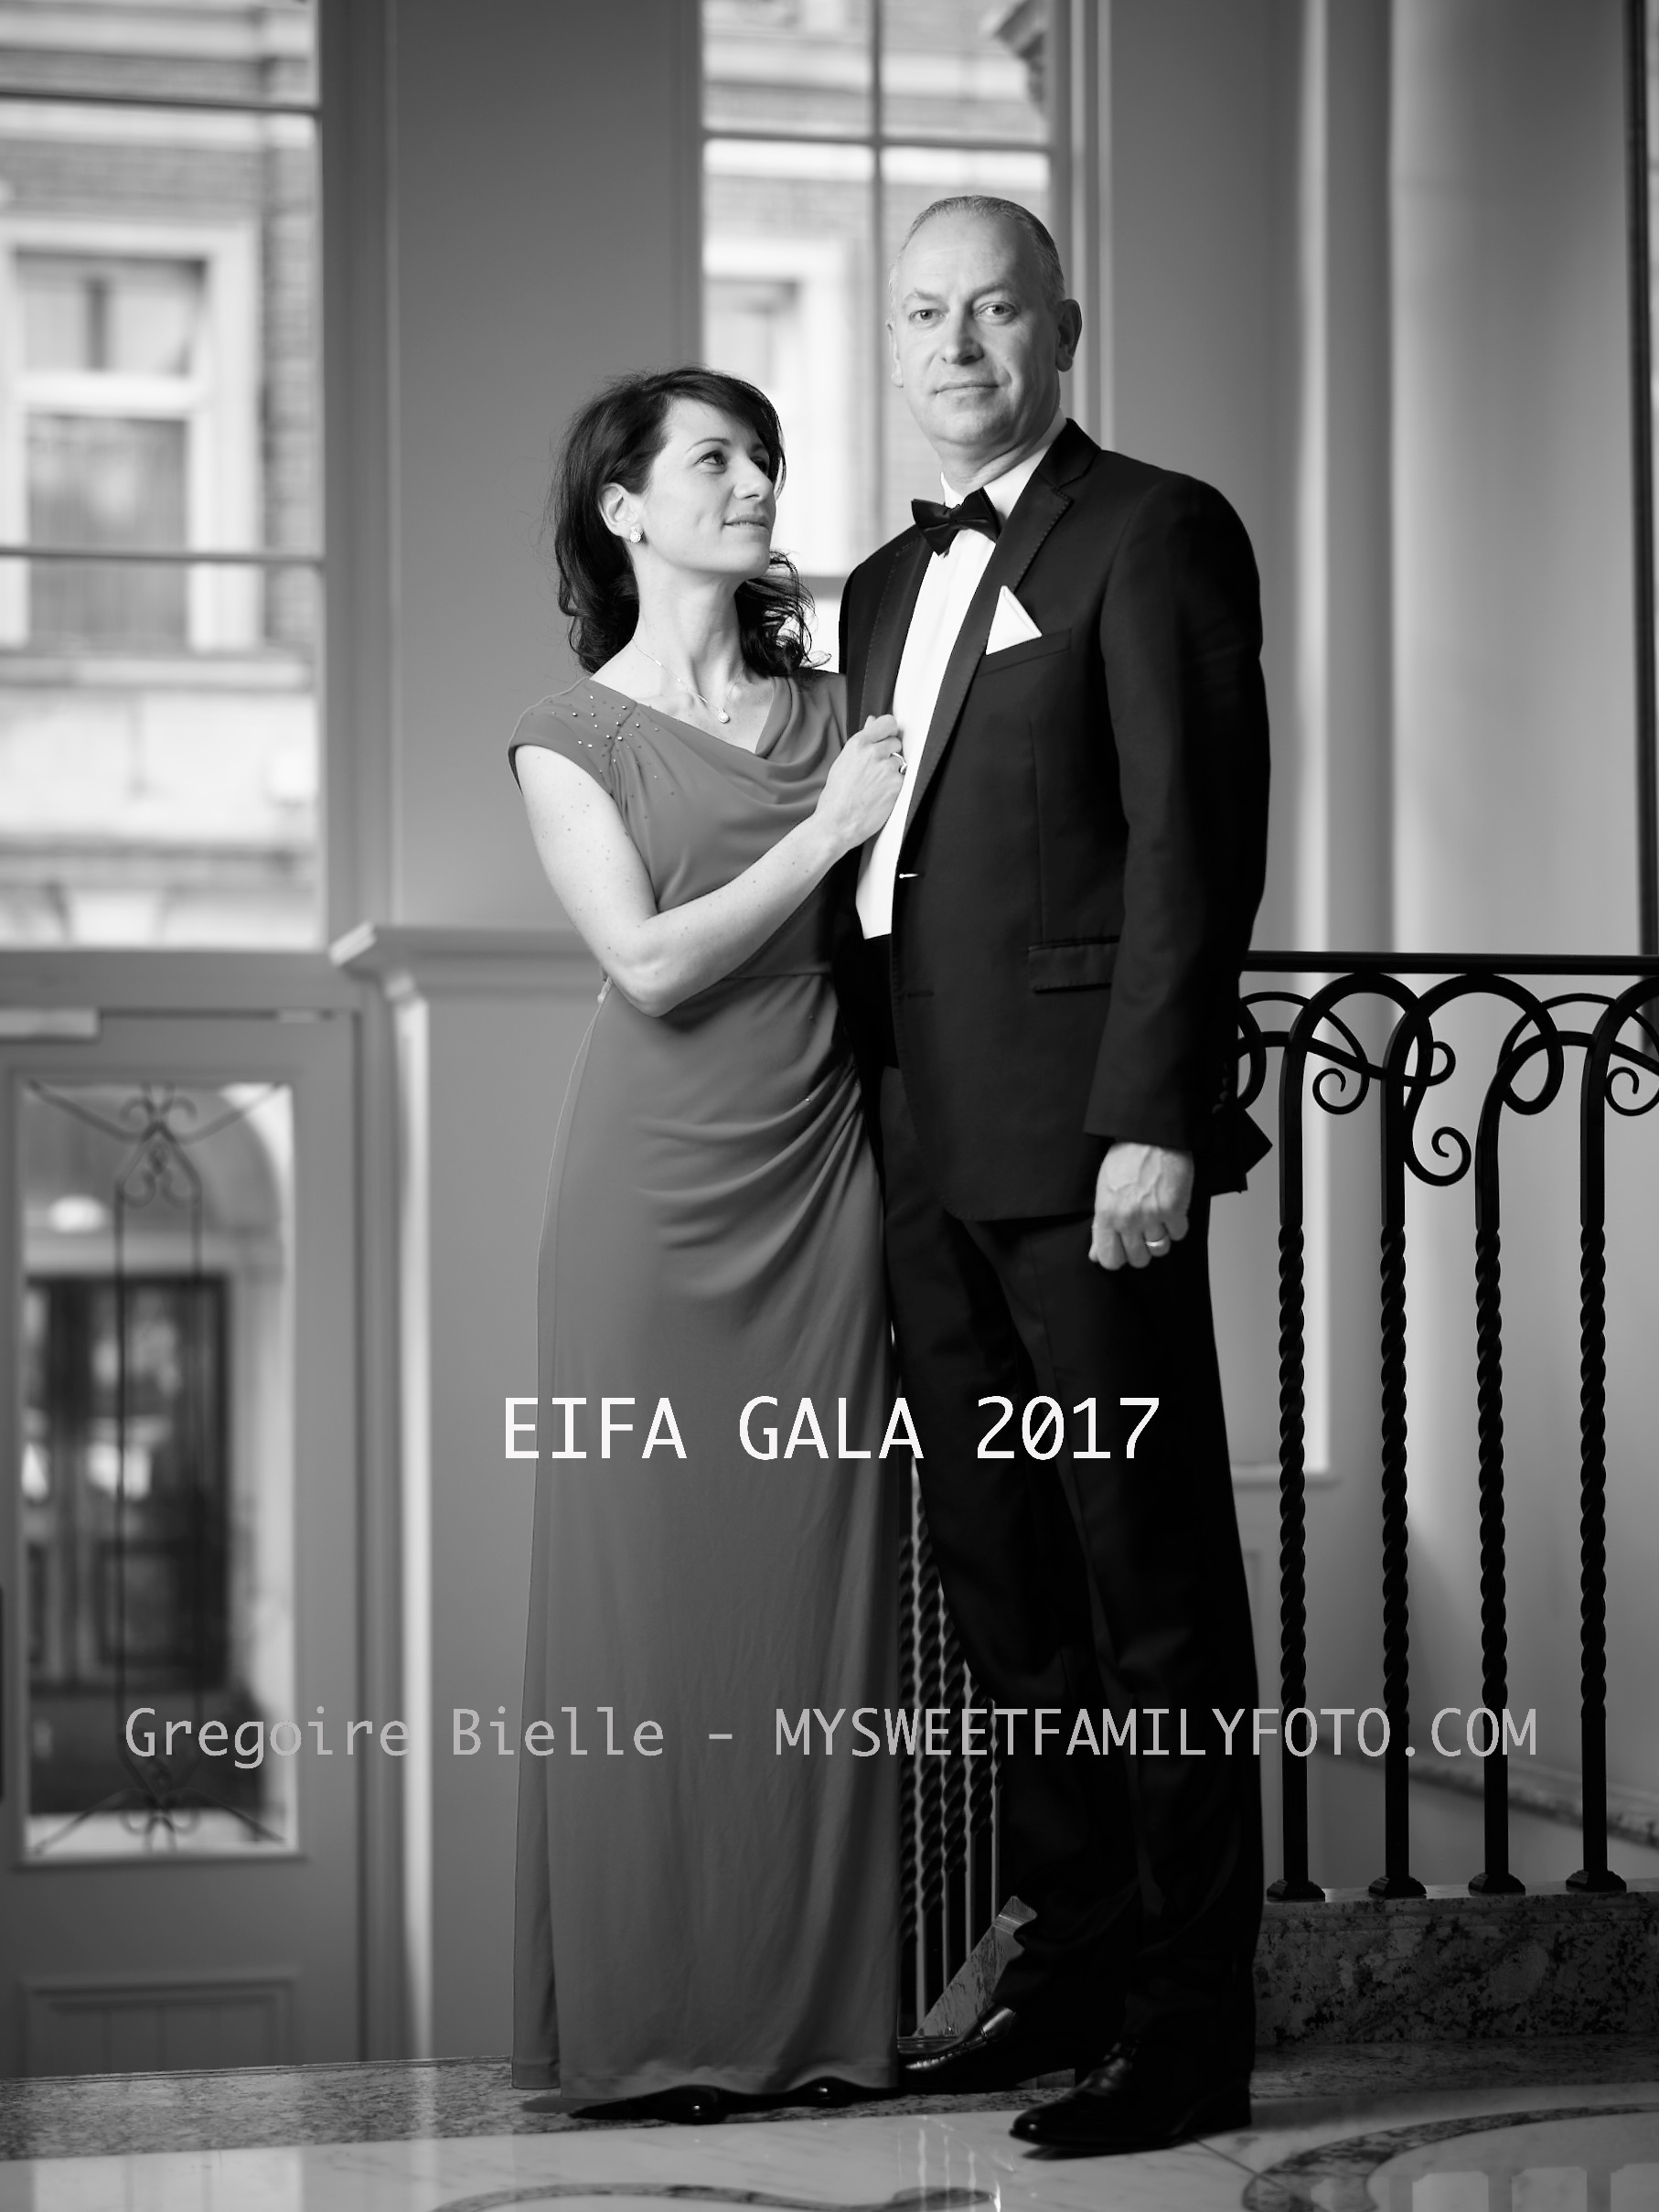 EIFA GALA 1017.jpg